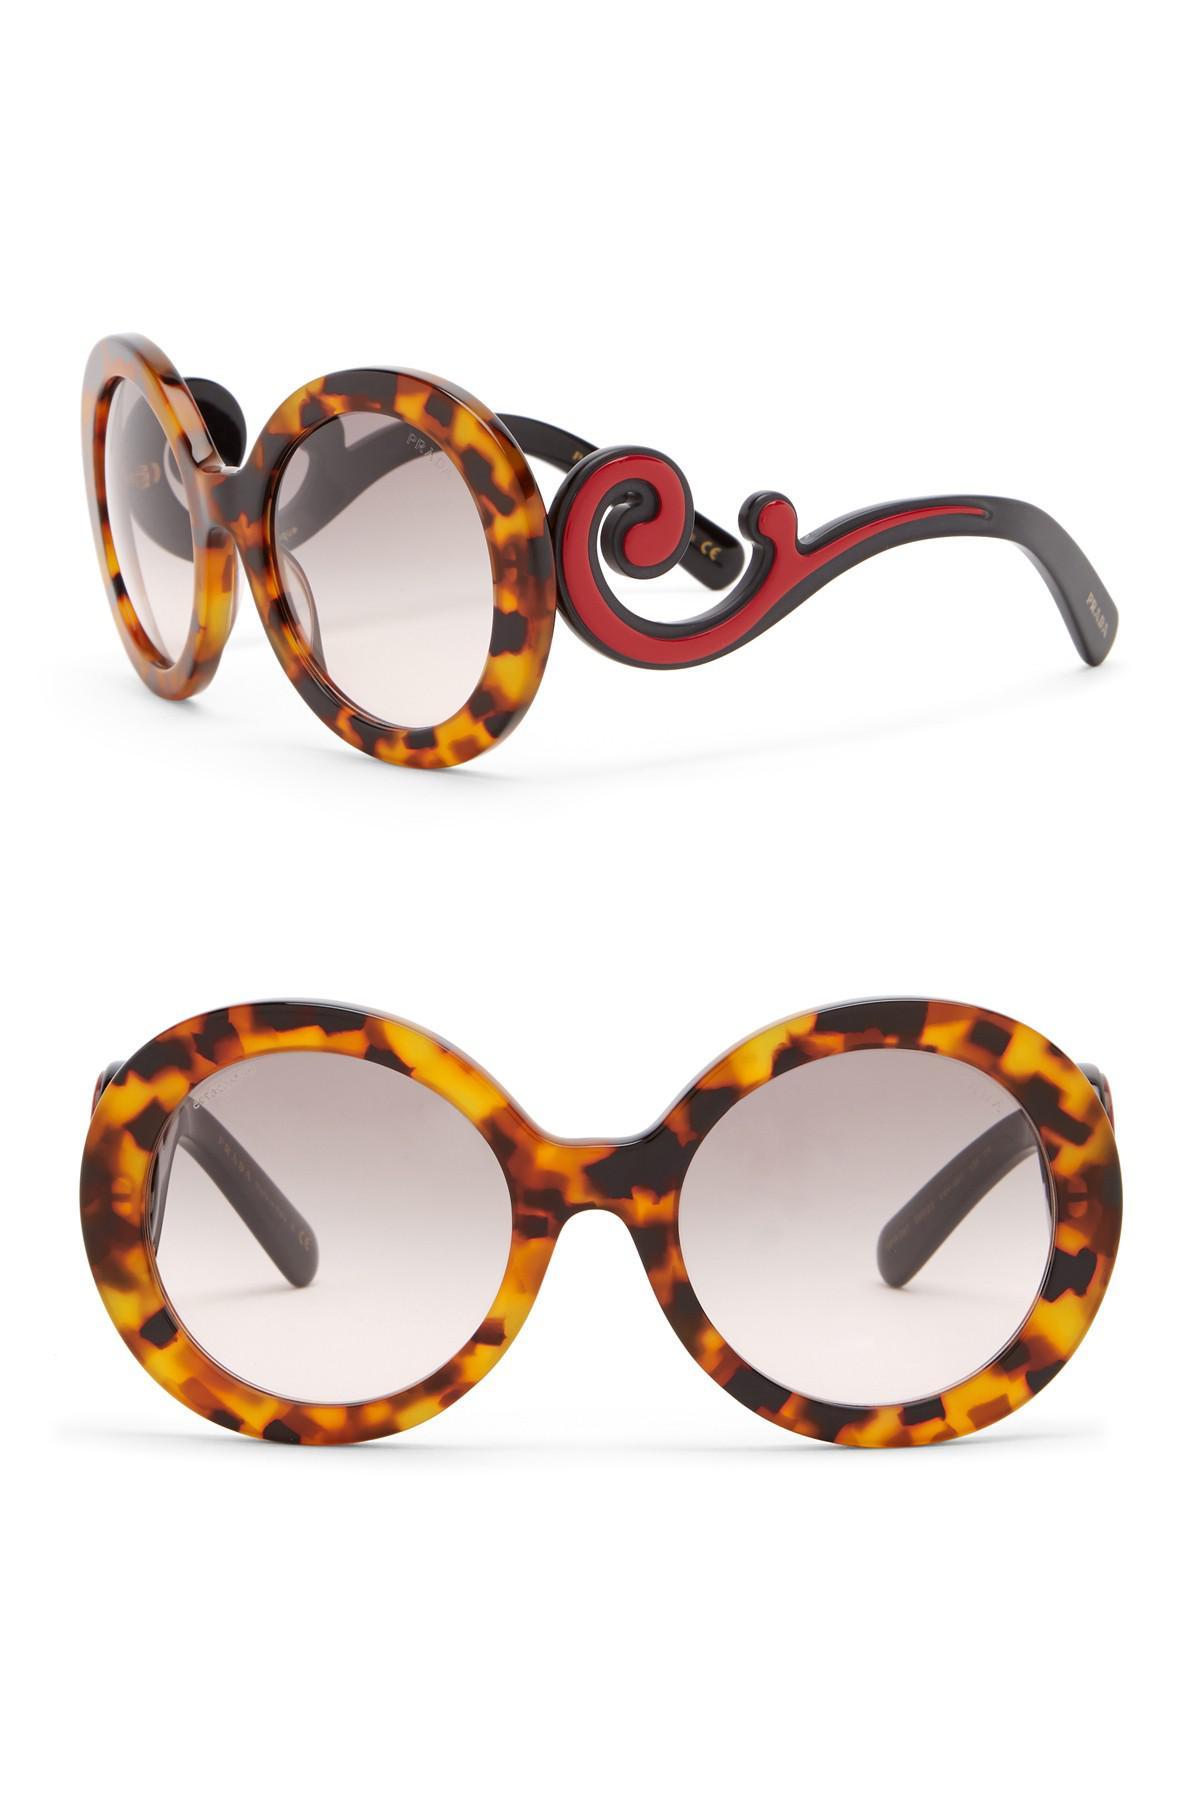 405ae58936dc Prada Women's 55mm Round Catwalk Minimal Baroque Sunglasses in Brown ...